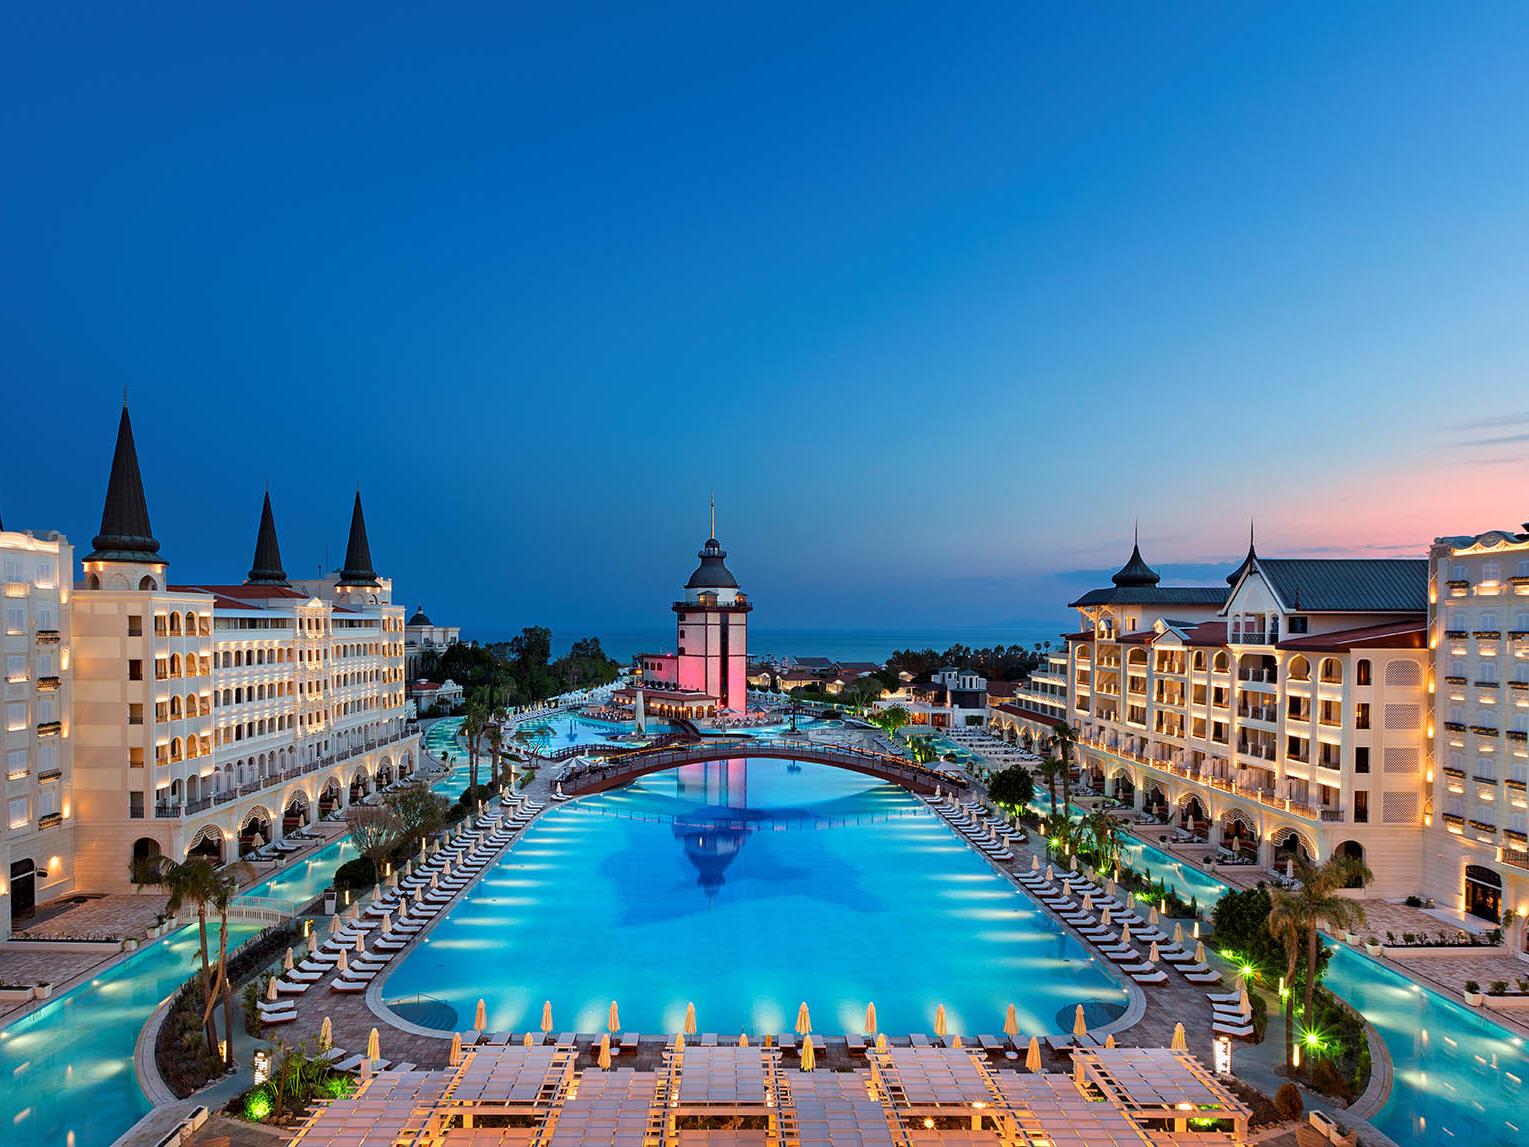 Mardanpalacehotel-Otel-Mermer-Dekorasyon- (17)